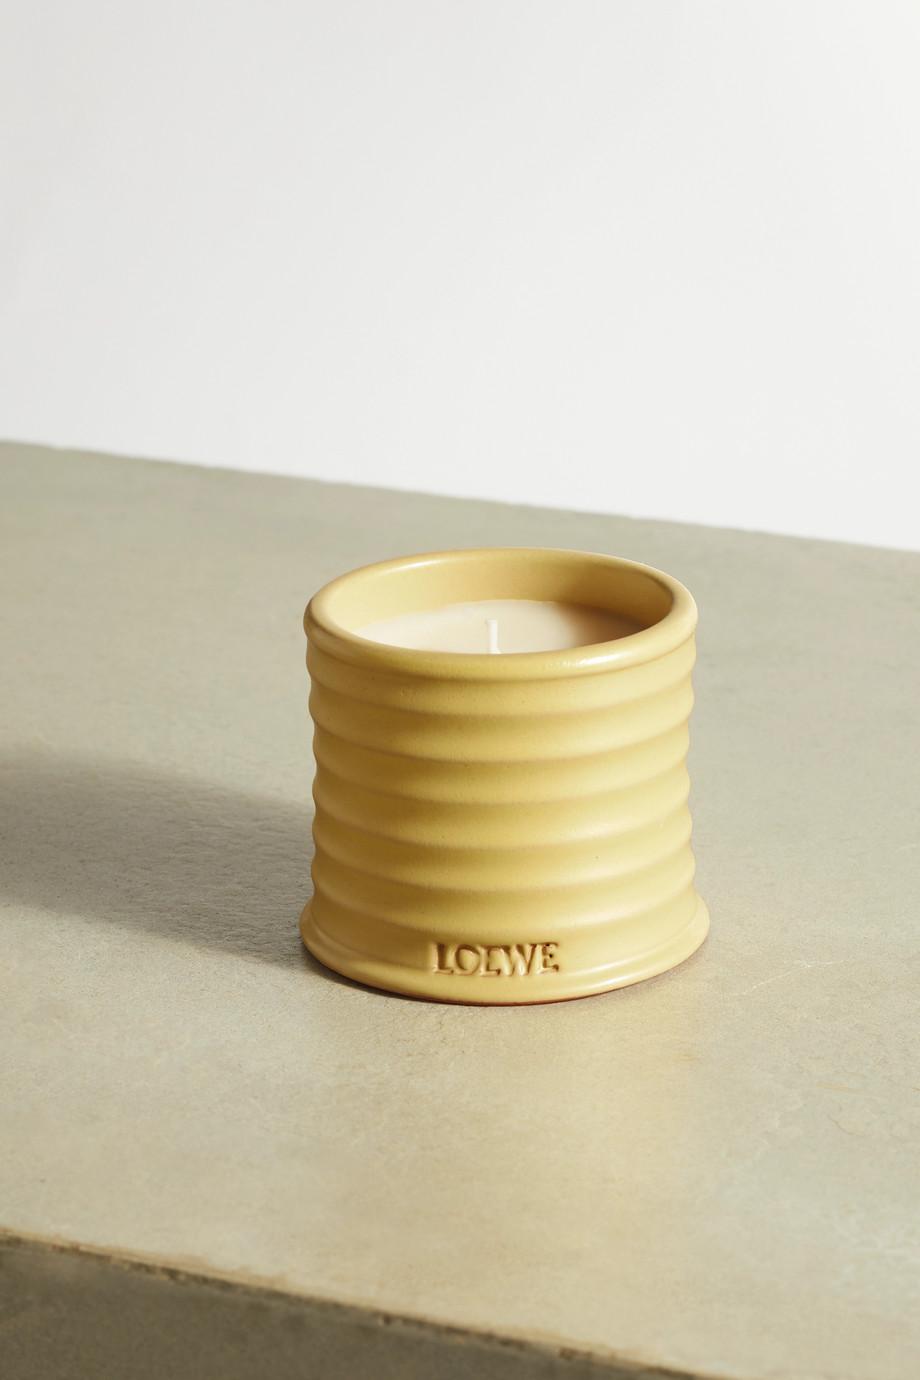 LOEWE Home Scents Bougie parfumée au chèvrefeuille Small, 170 g